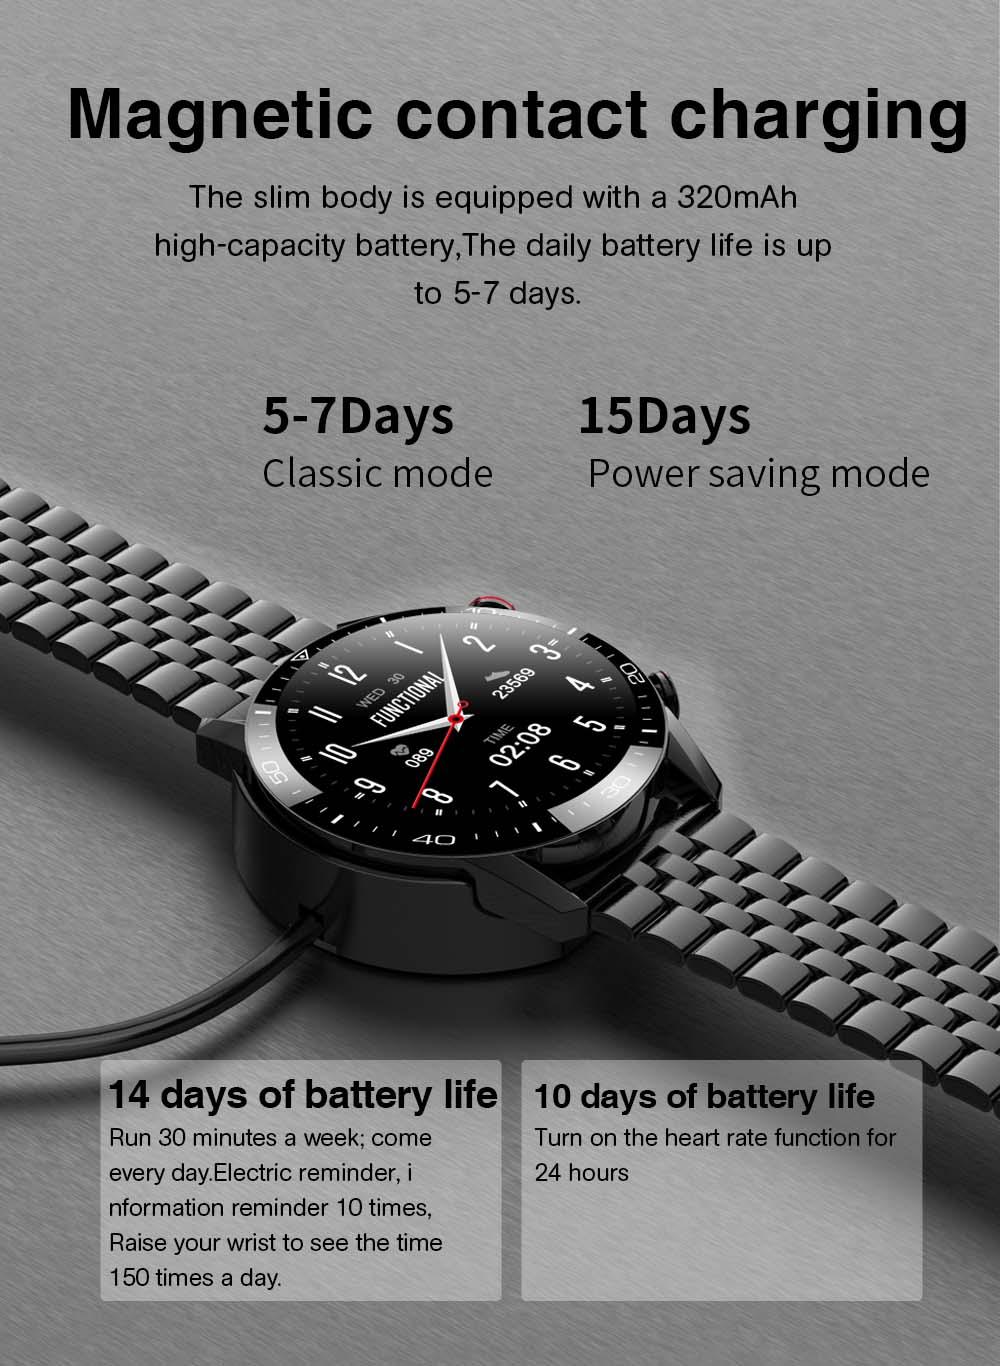 Hd9a5916facb64dccaad1d4fd65443221d TK2-8 Smart Watch For Men Bluetooth Call IP68 Waterproof Blood Pressure Heart Rate Monitor New SmartWatch Sports Fitness Tracker